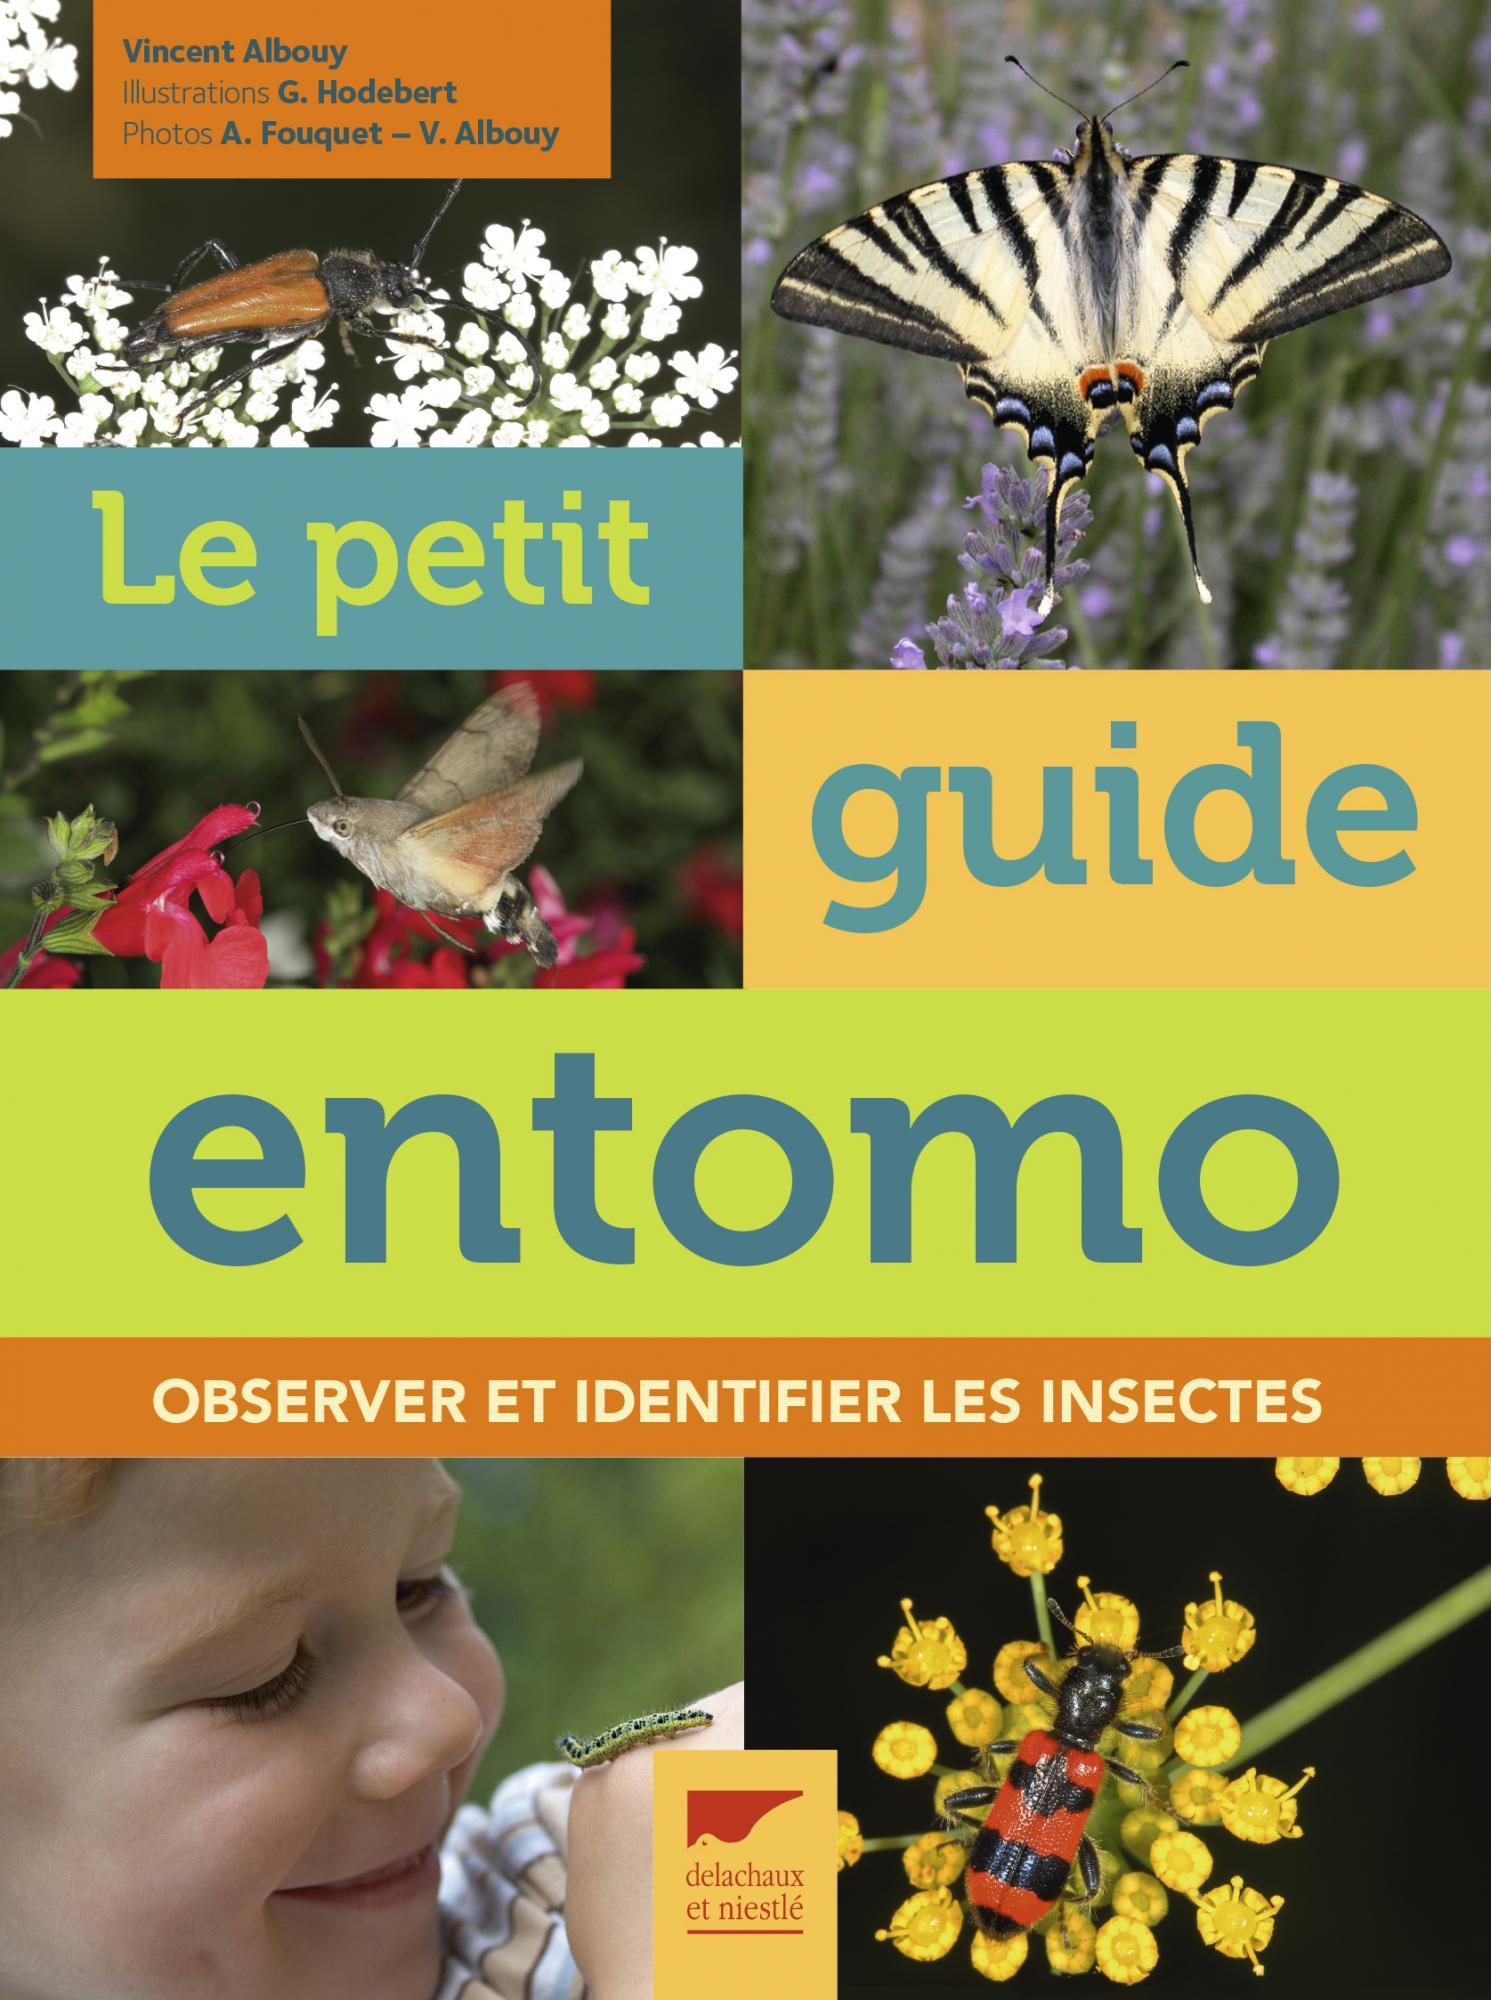 Le petit guide entomo